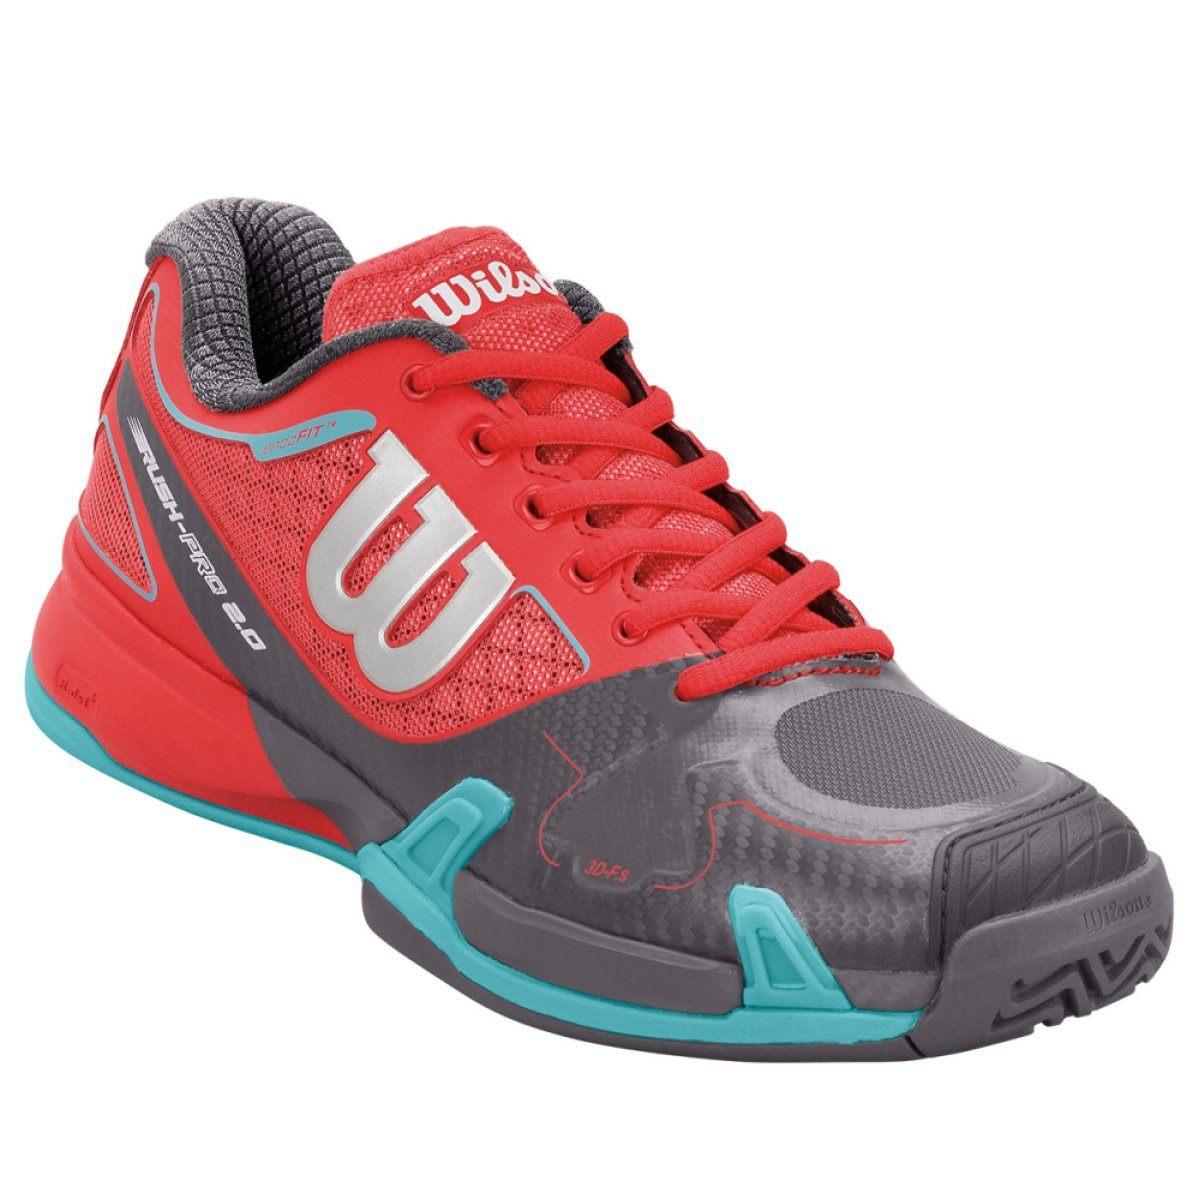 Wilson Unisex-Erwachsene Rush Pro 2.0 W Tennisschuhe: Amazon.de: Schuhe &  Handtaschen